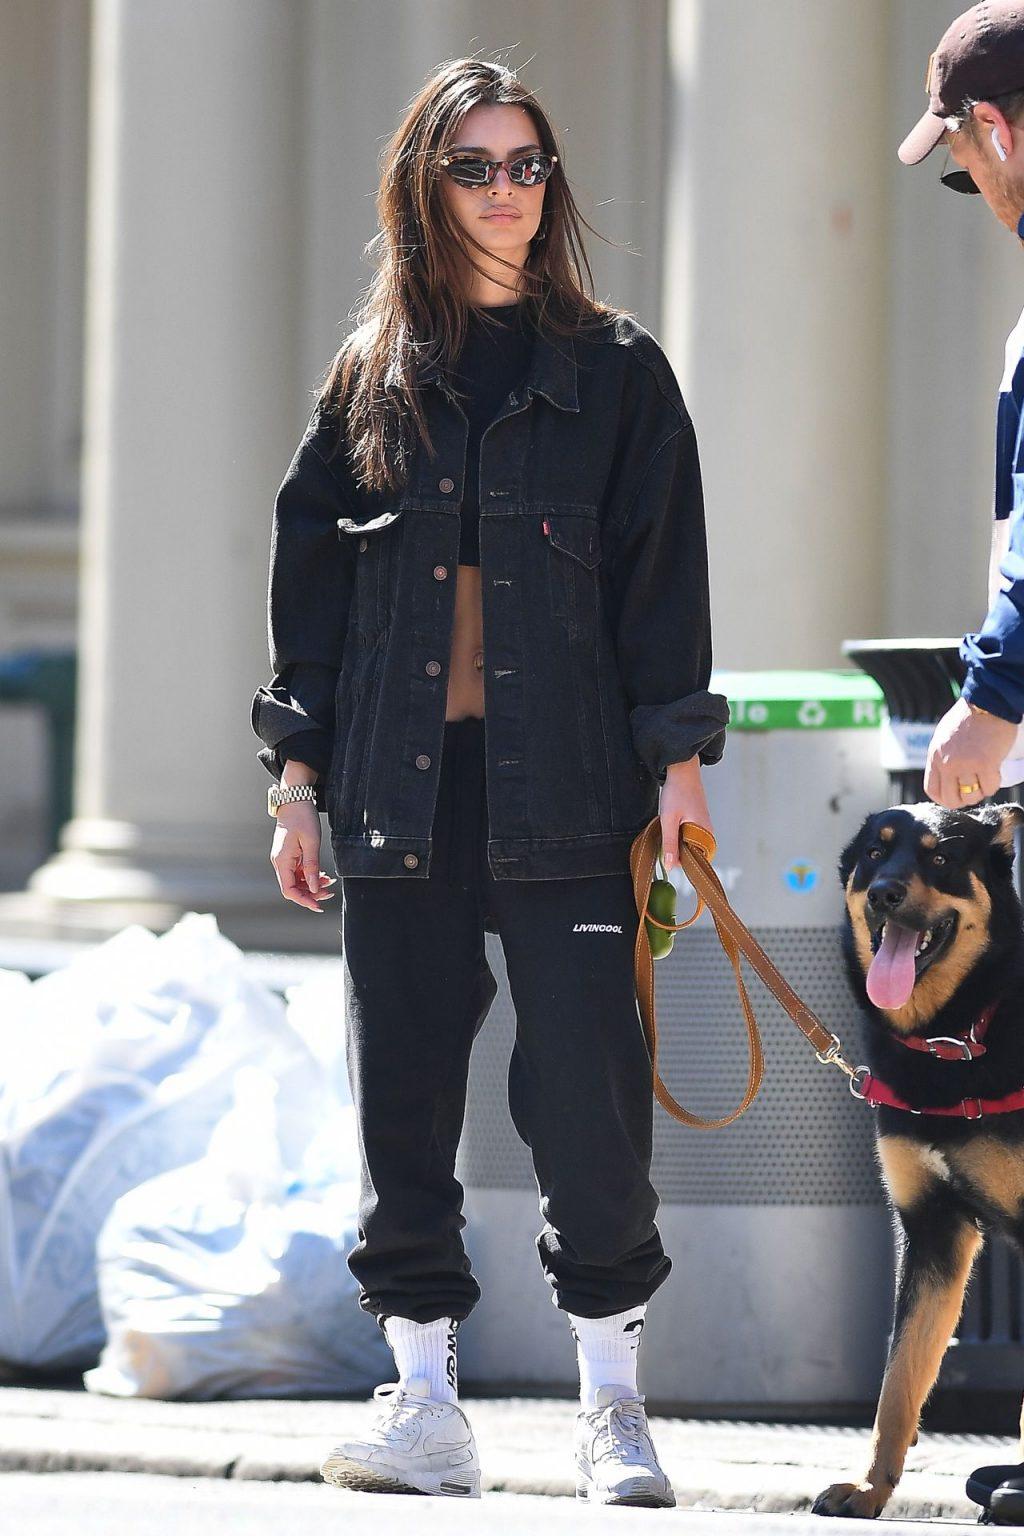 Emily Ratajkowski Walks With Her Dog Colombo in NYC (38 Photos)